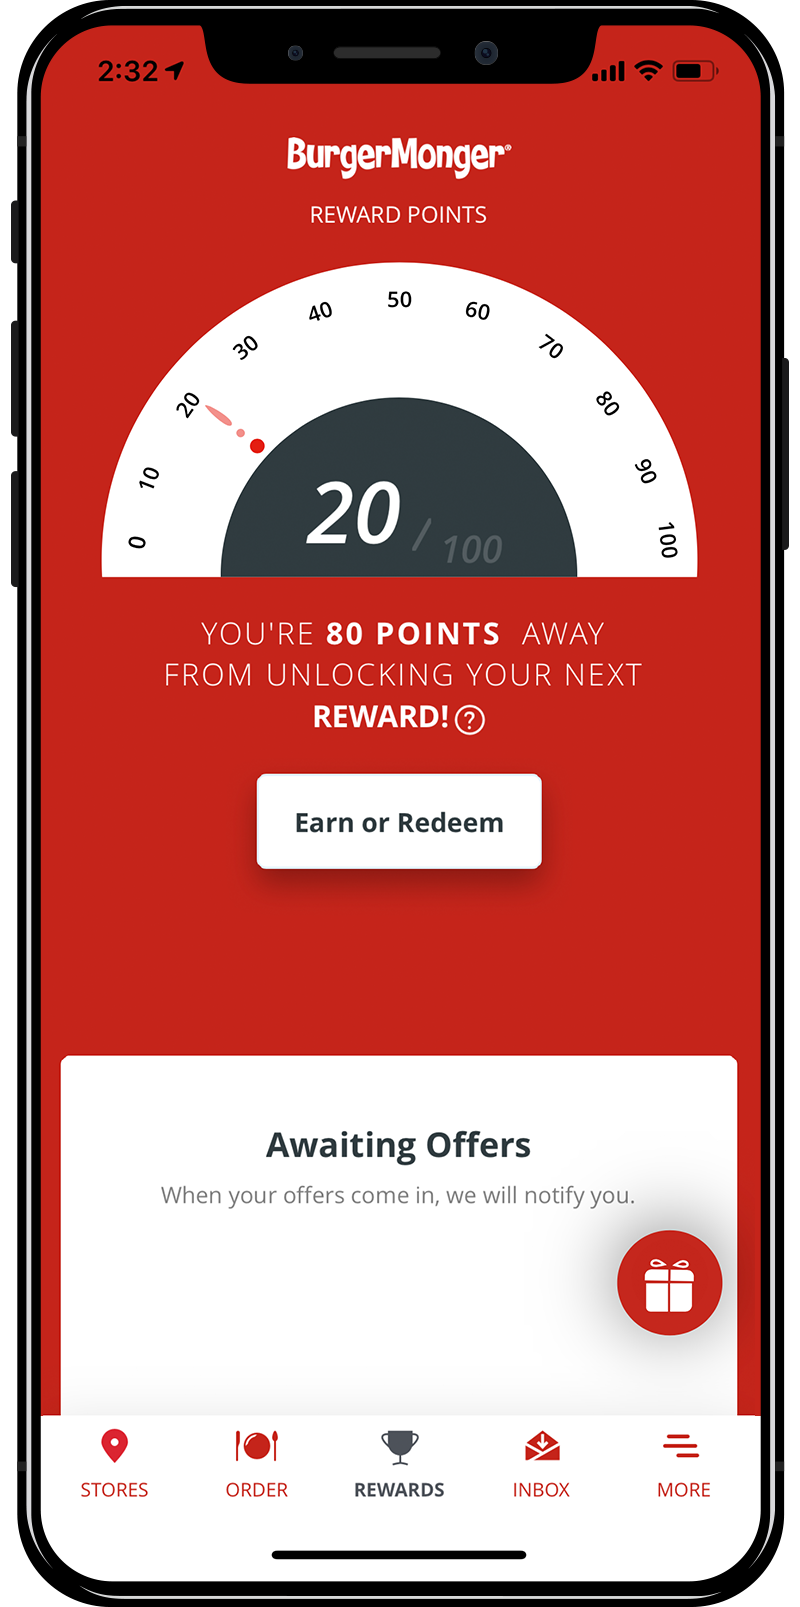 Burger Monger Rewards App